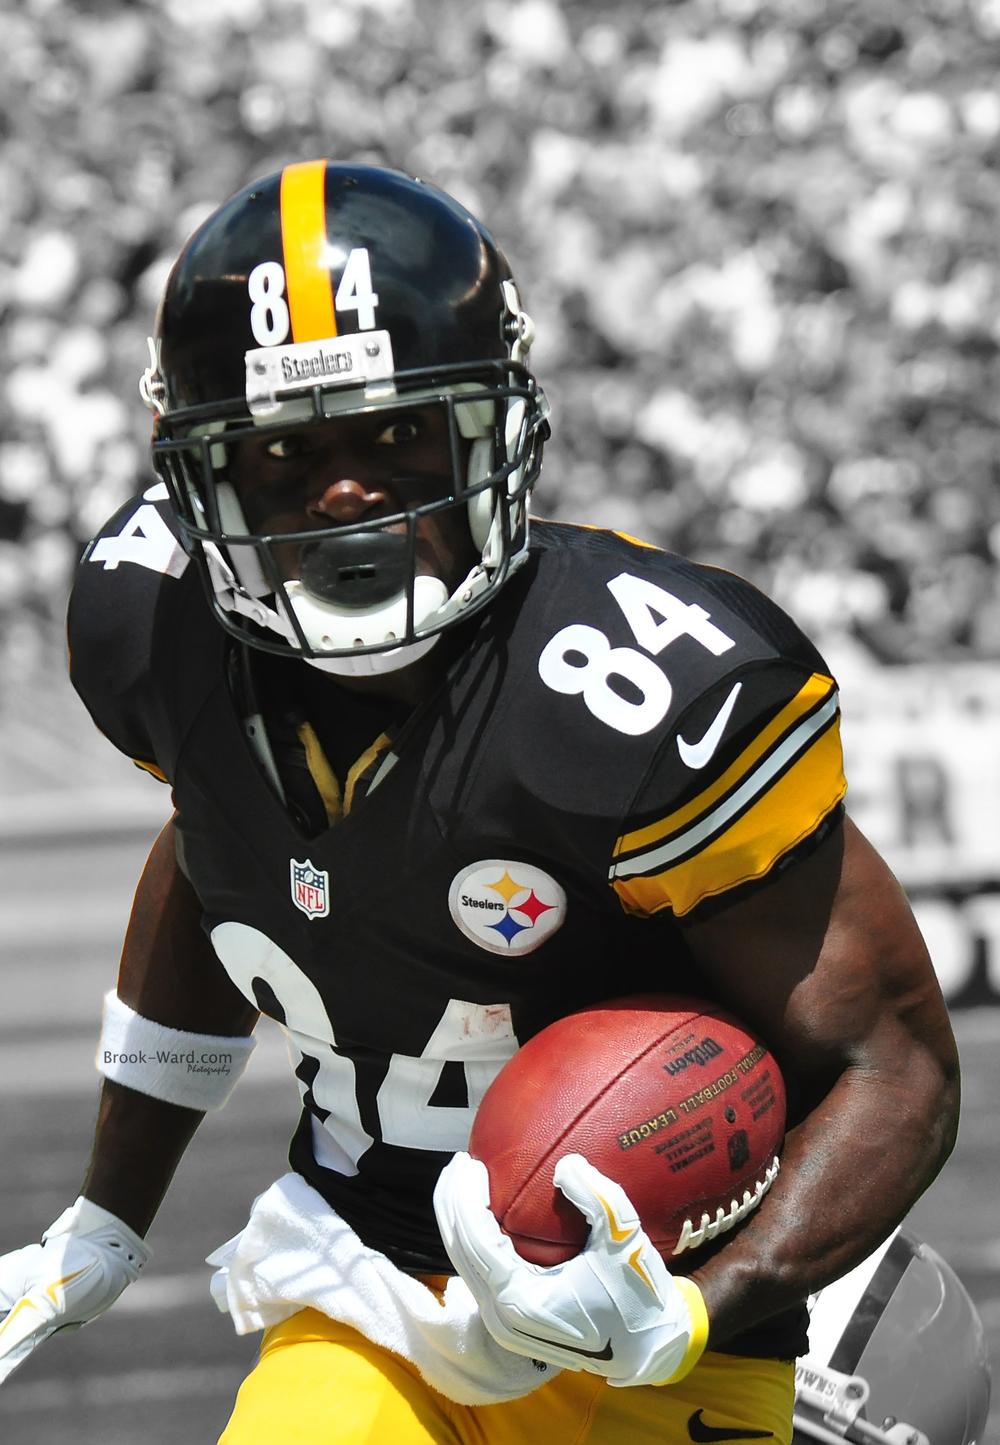 [48+] Steelers Antonio Brown Wallpaper HD on WallpaperSafari